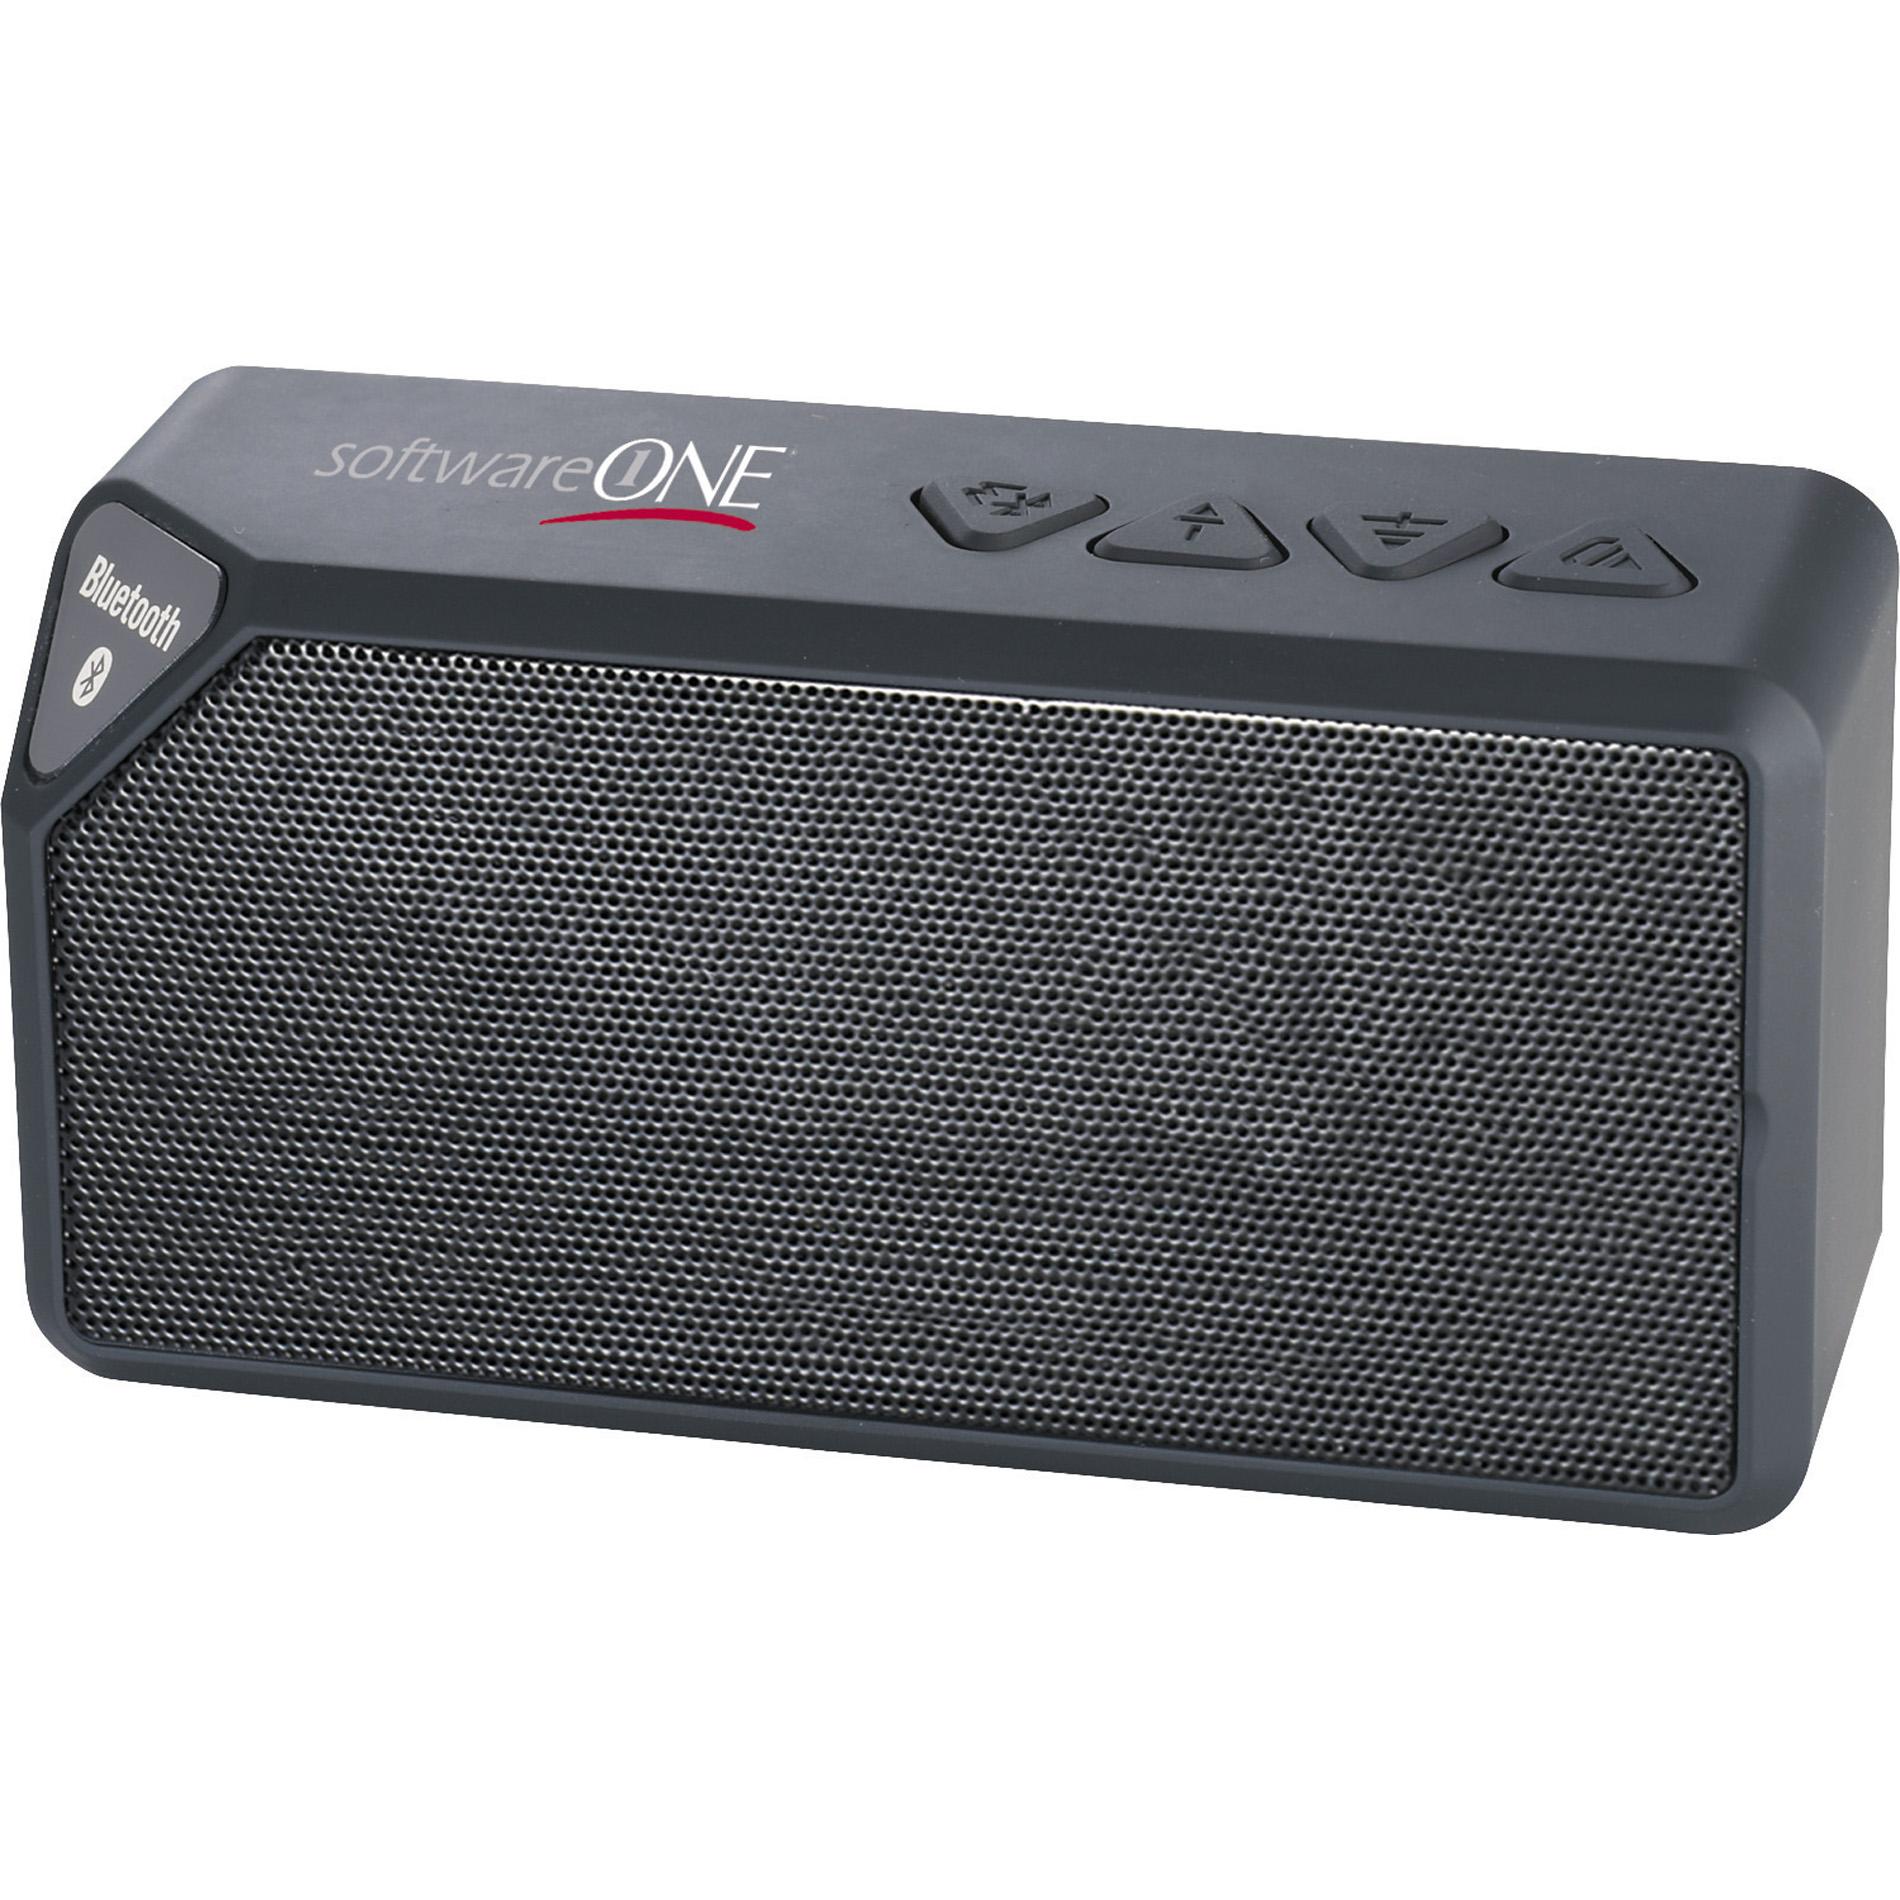 Jabba Bluetooth Speaker - 8-8 - Leeds